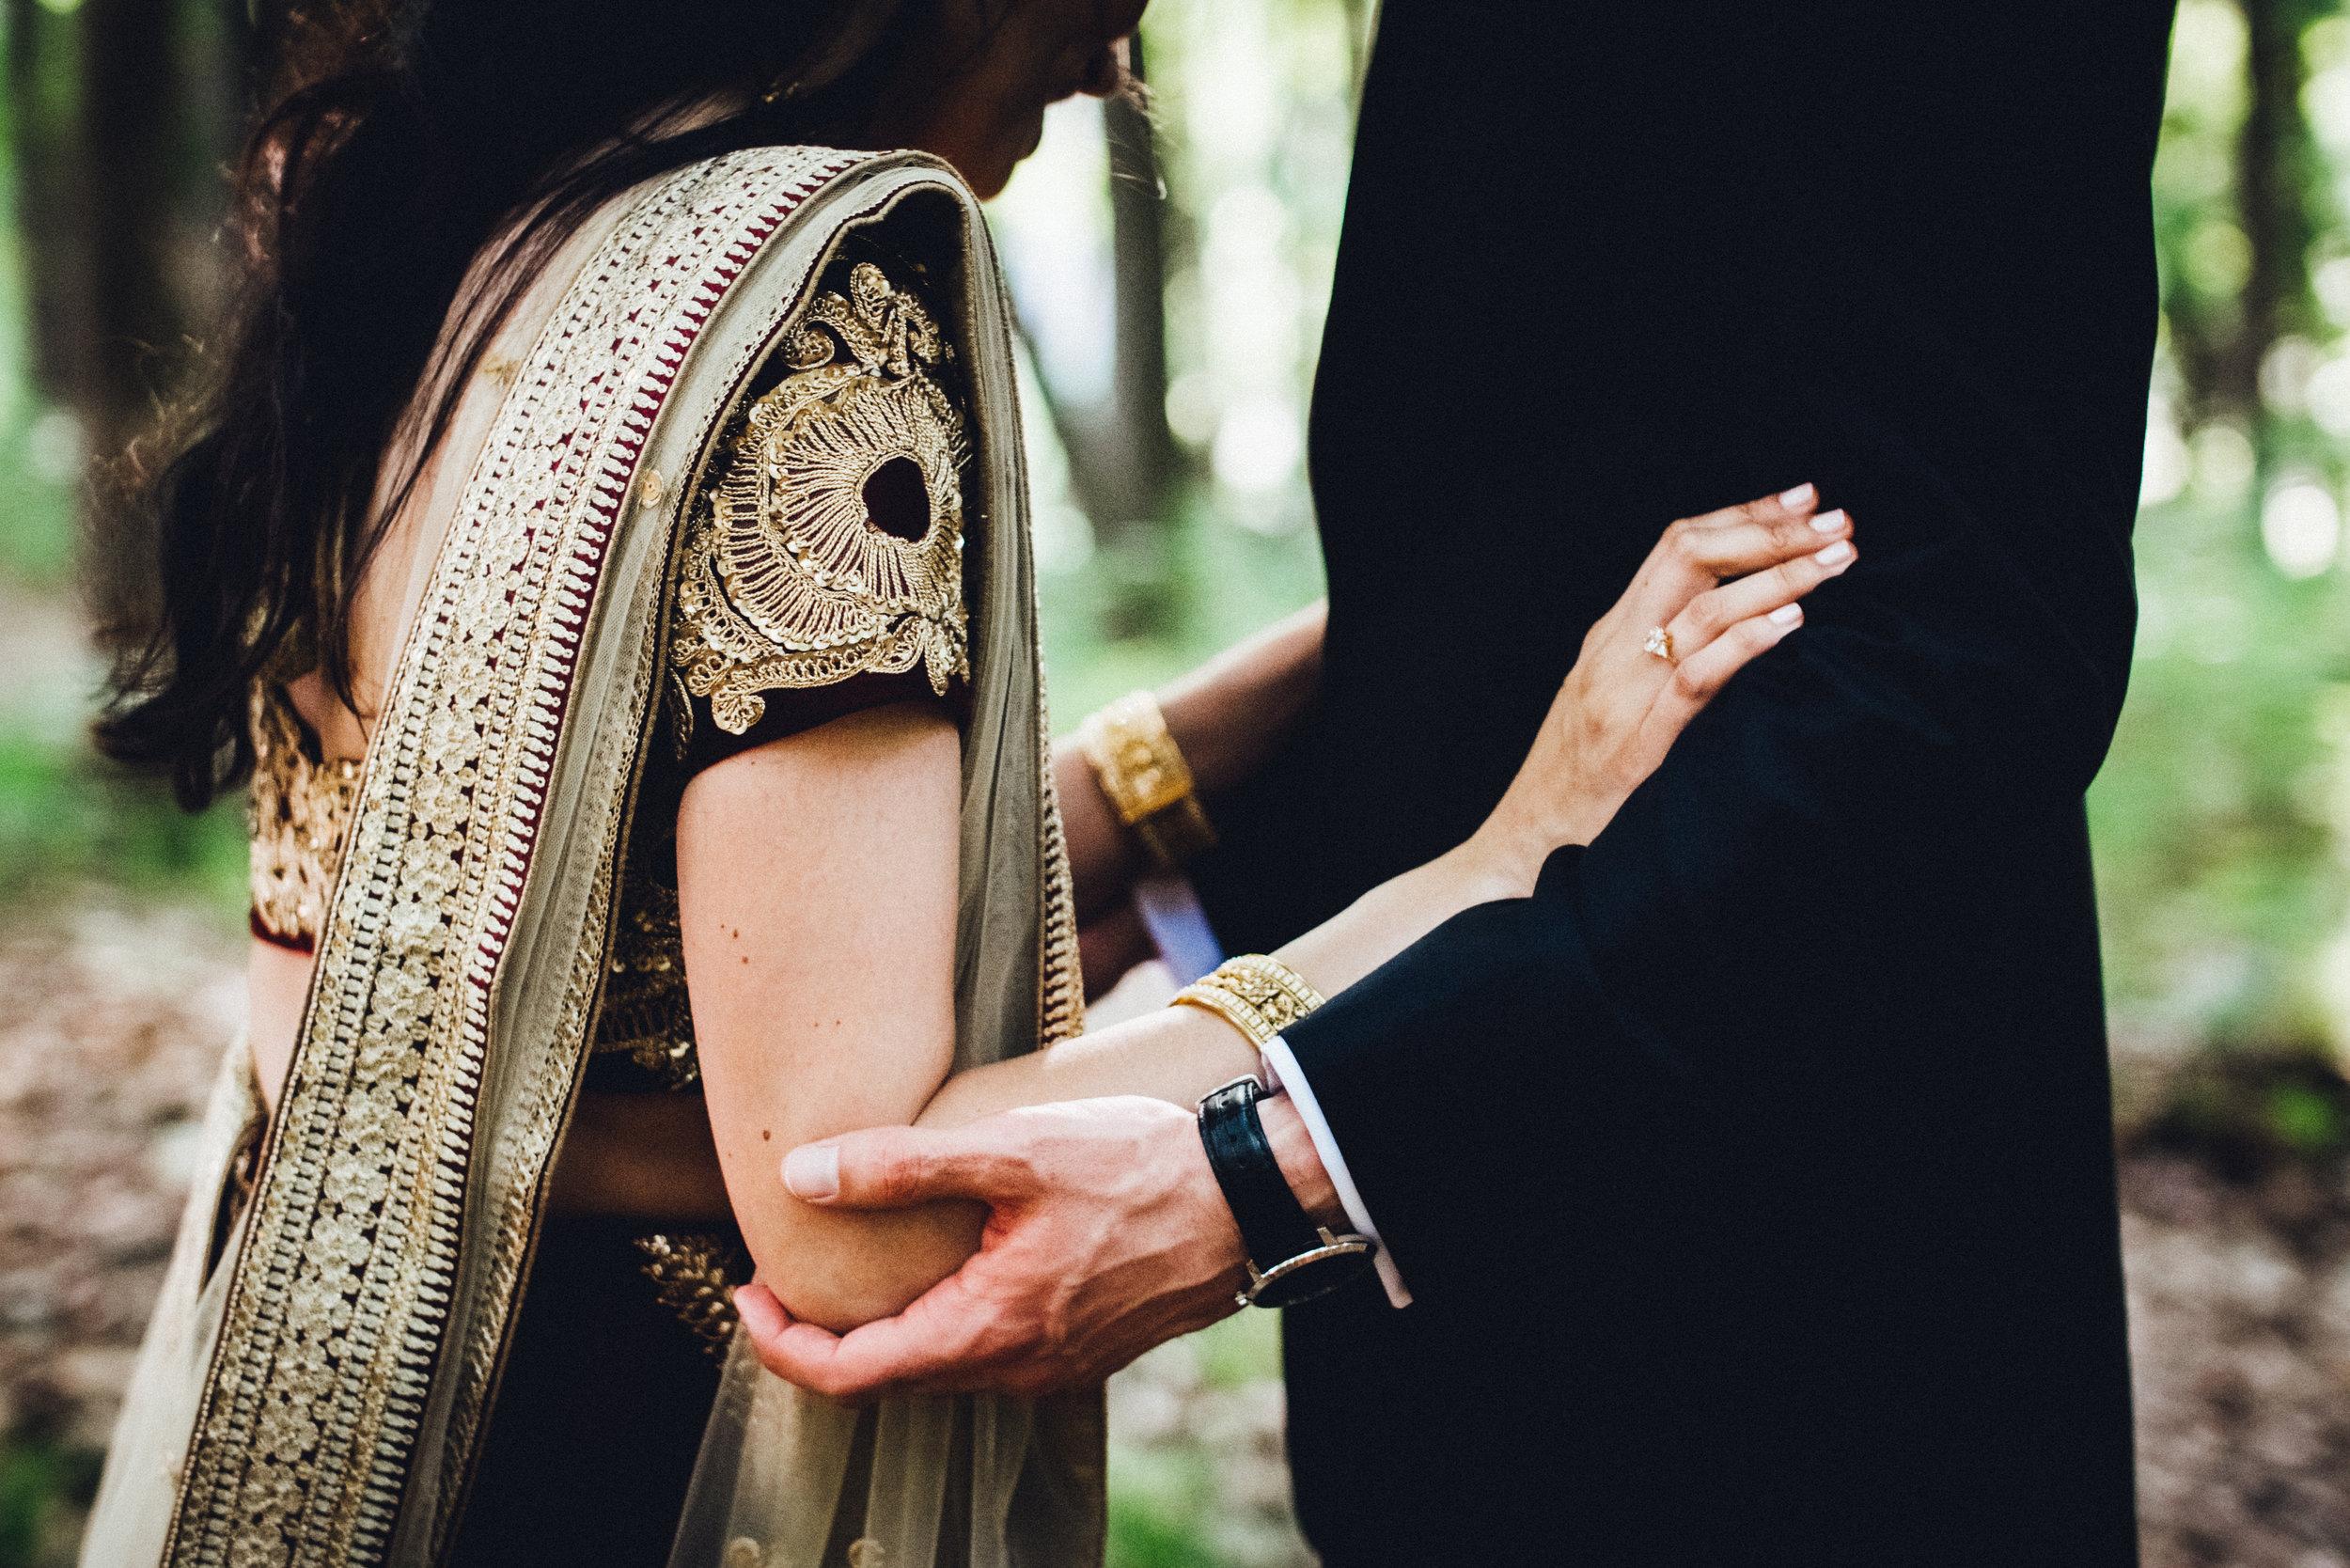 award-winning-meadow-brook-hall-avani-khristoph-becker-bhatt-wedding-shadow-shine-pictures-videogarphers-cinematographers-photographers